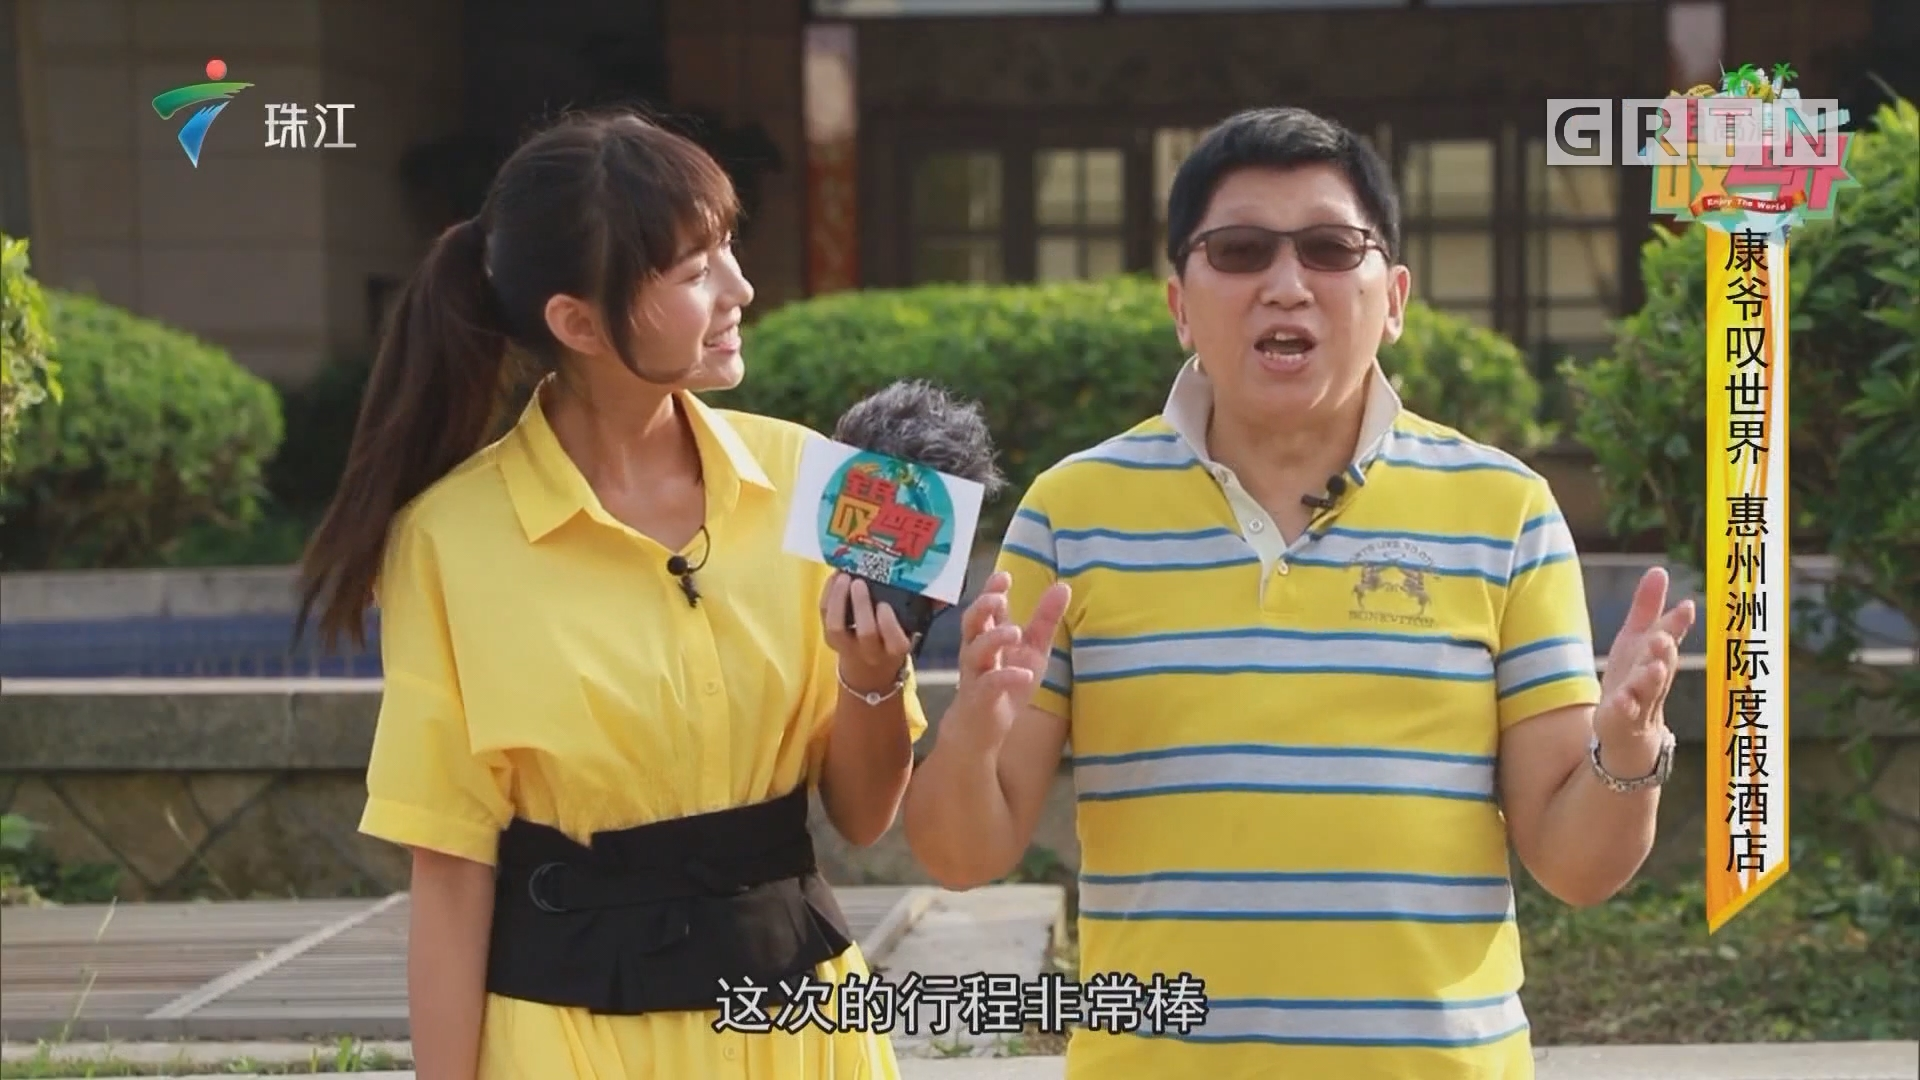 [HD][2019-05-31]全民叹世界:惠州洲际度假酒店